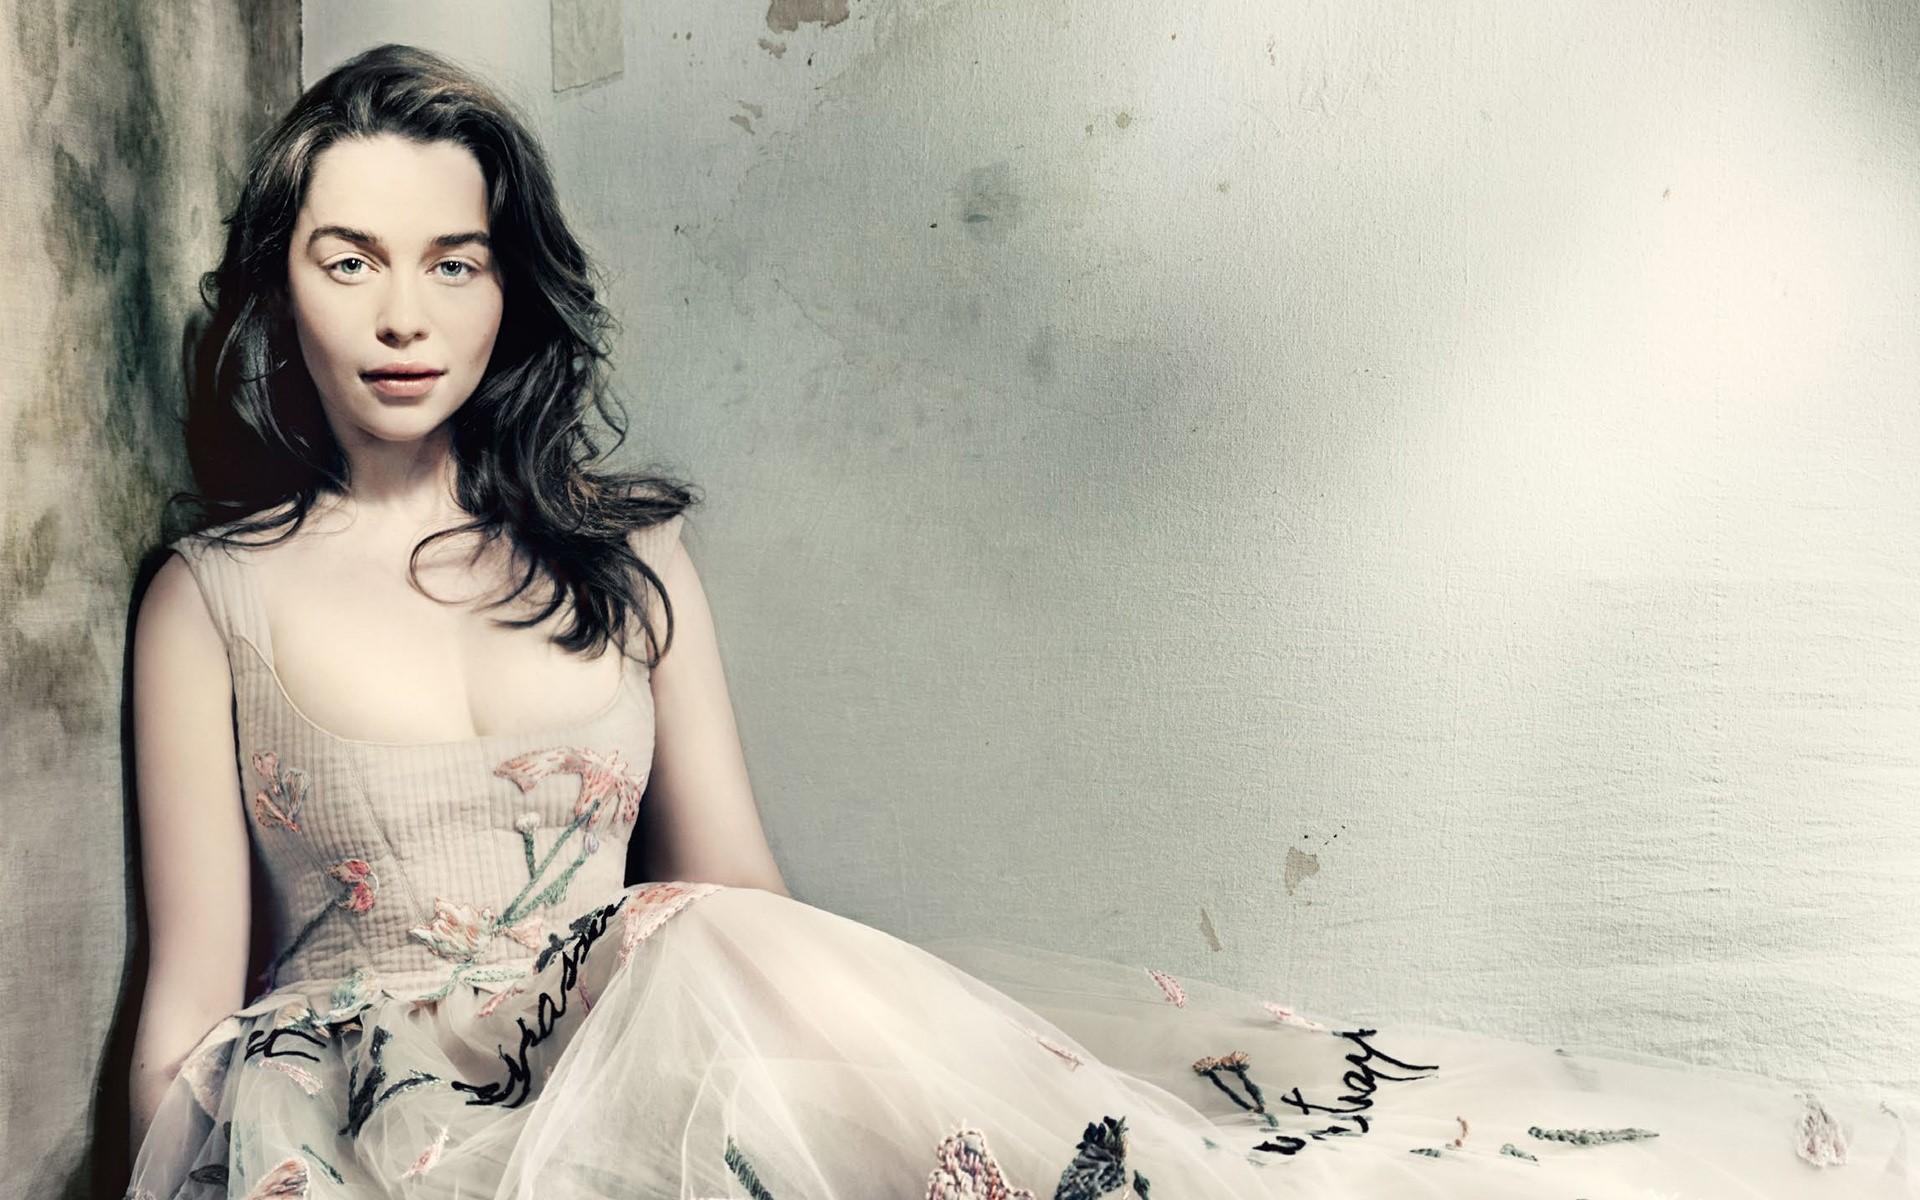 Fondos de pantalla Emilia Clarke en Vogue